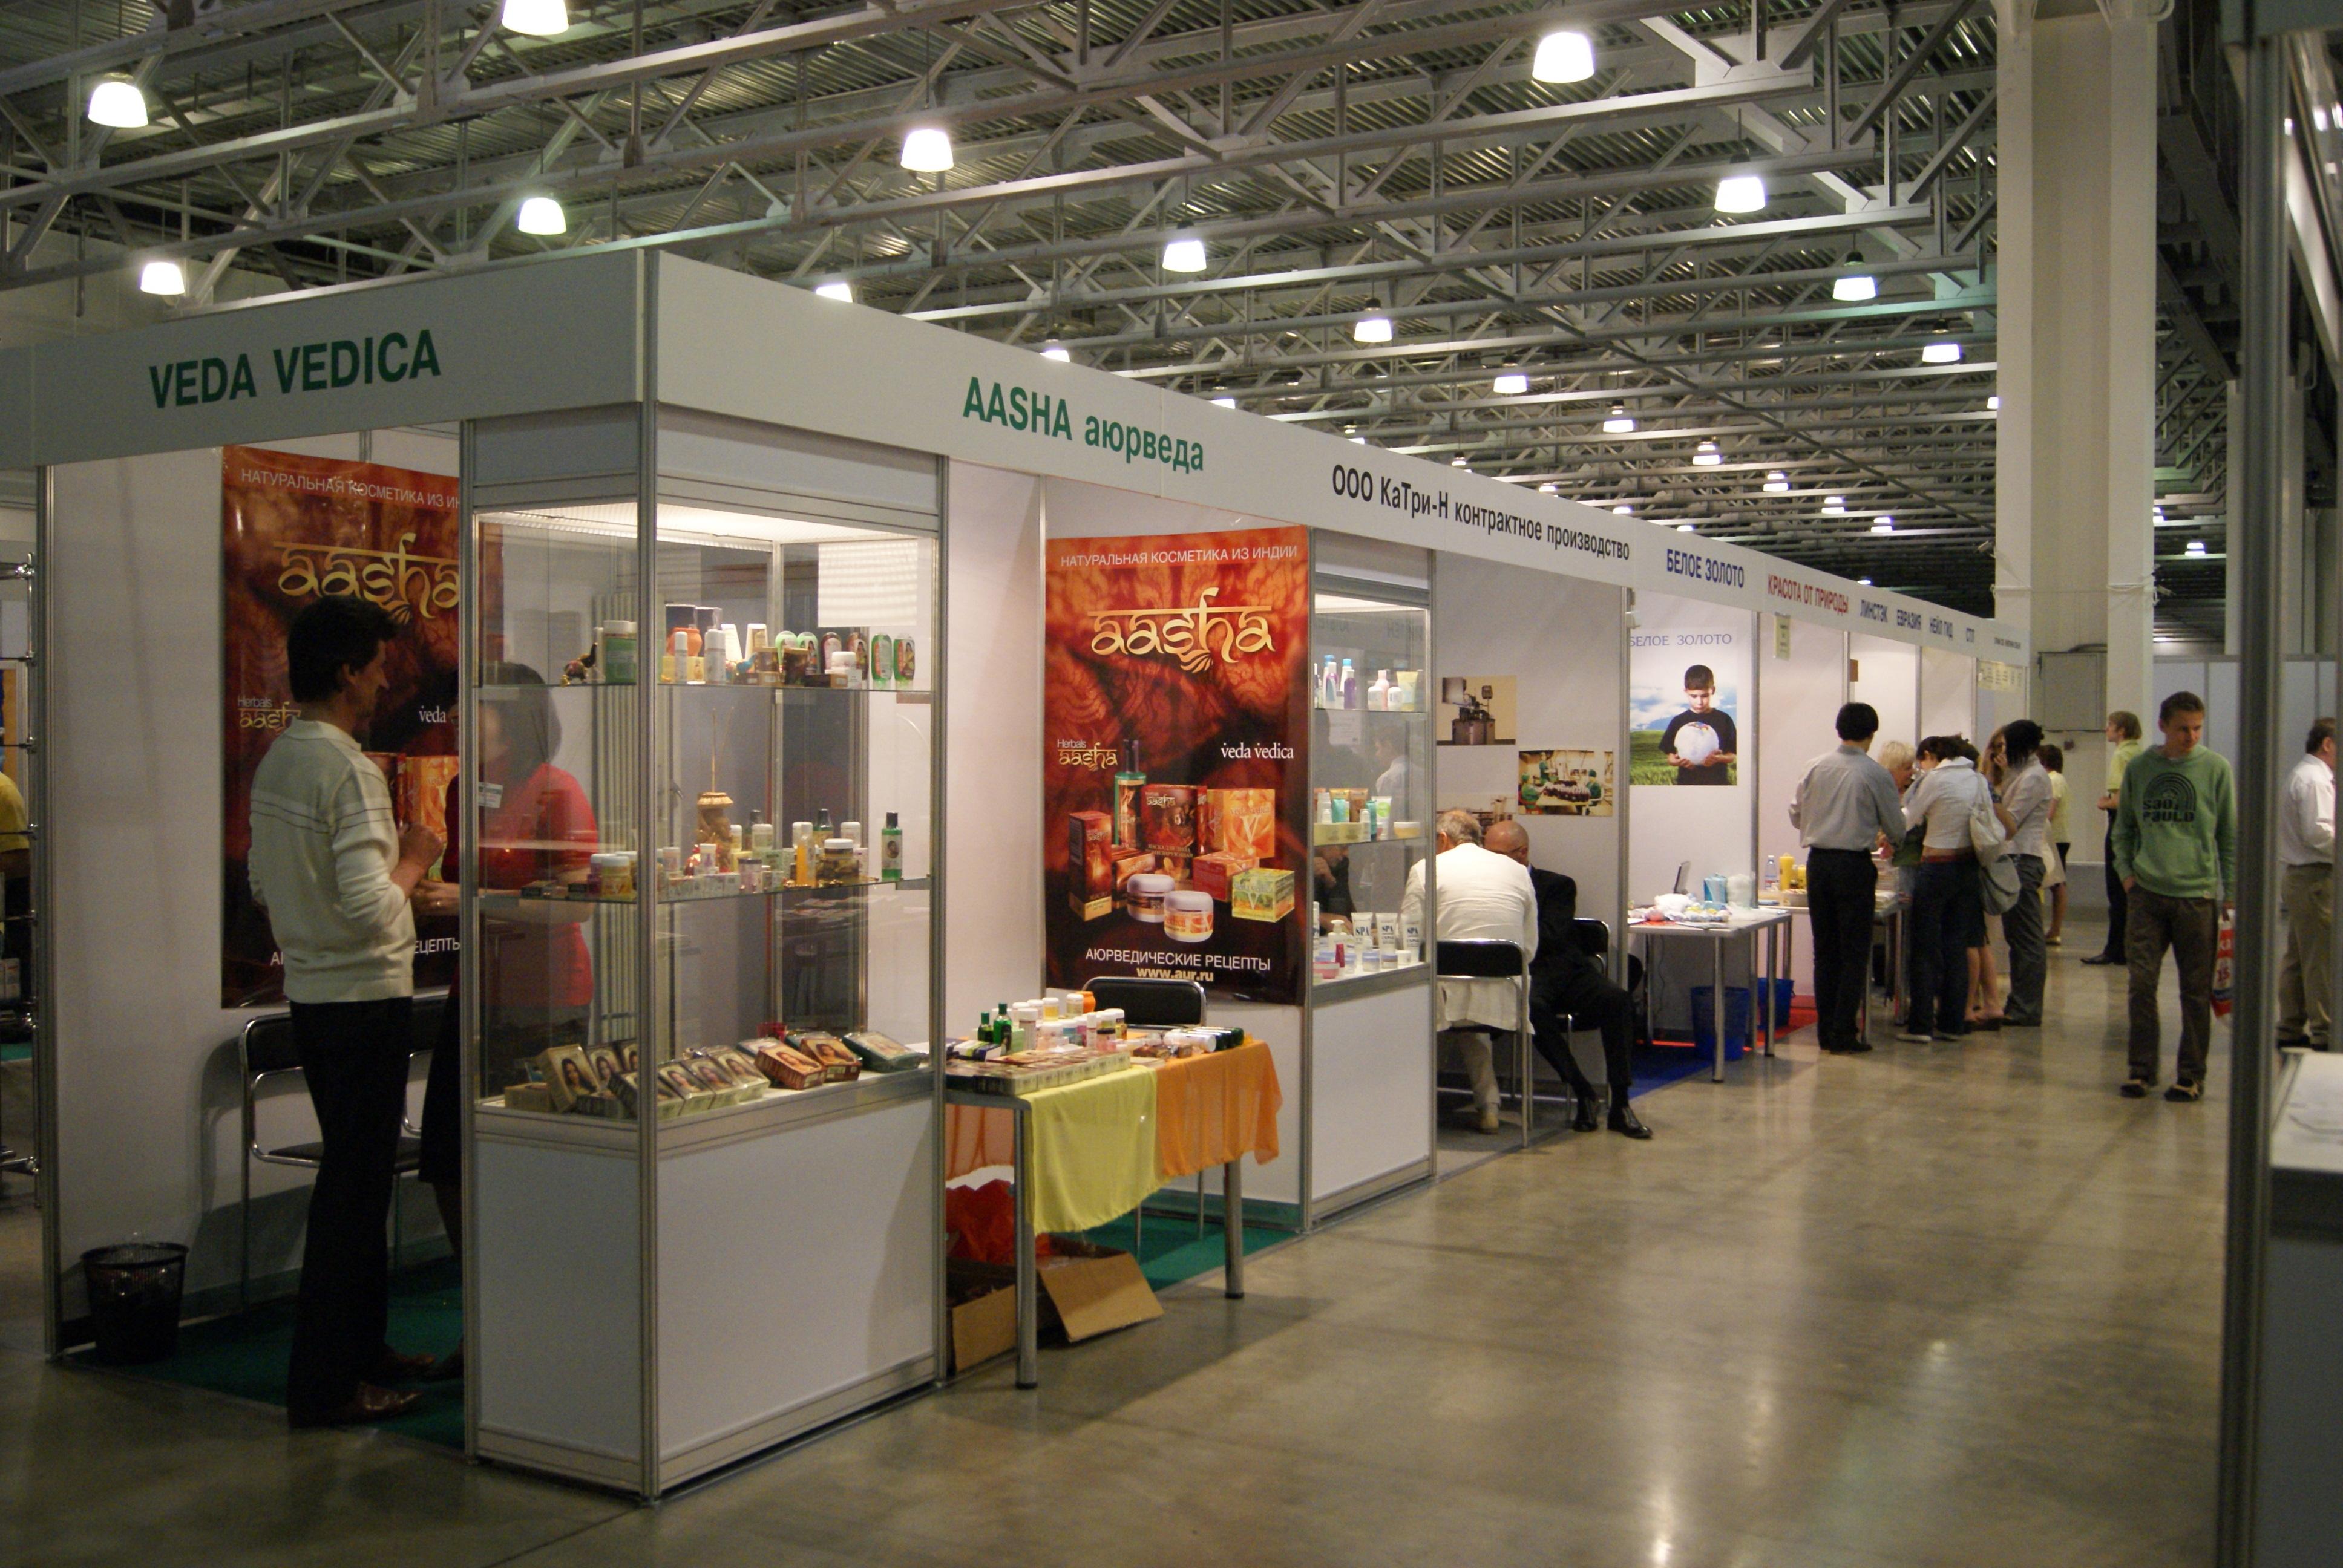 exhibition center: